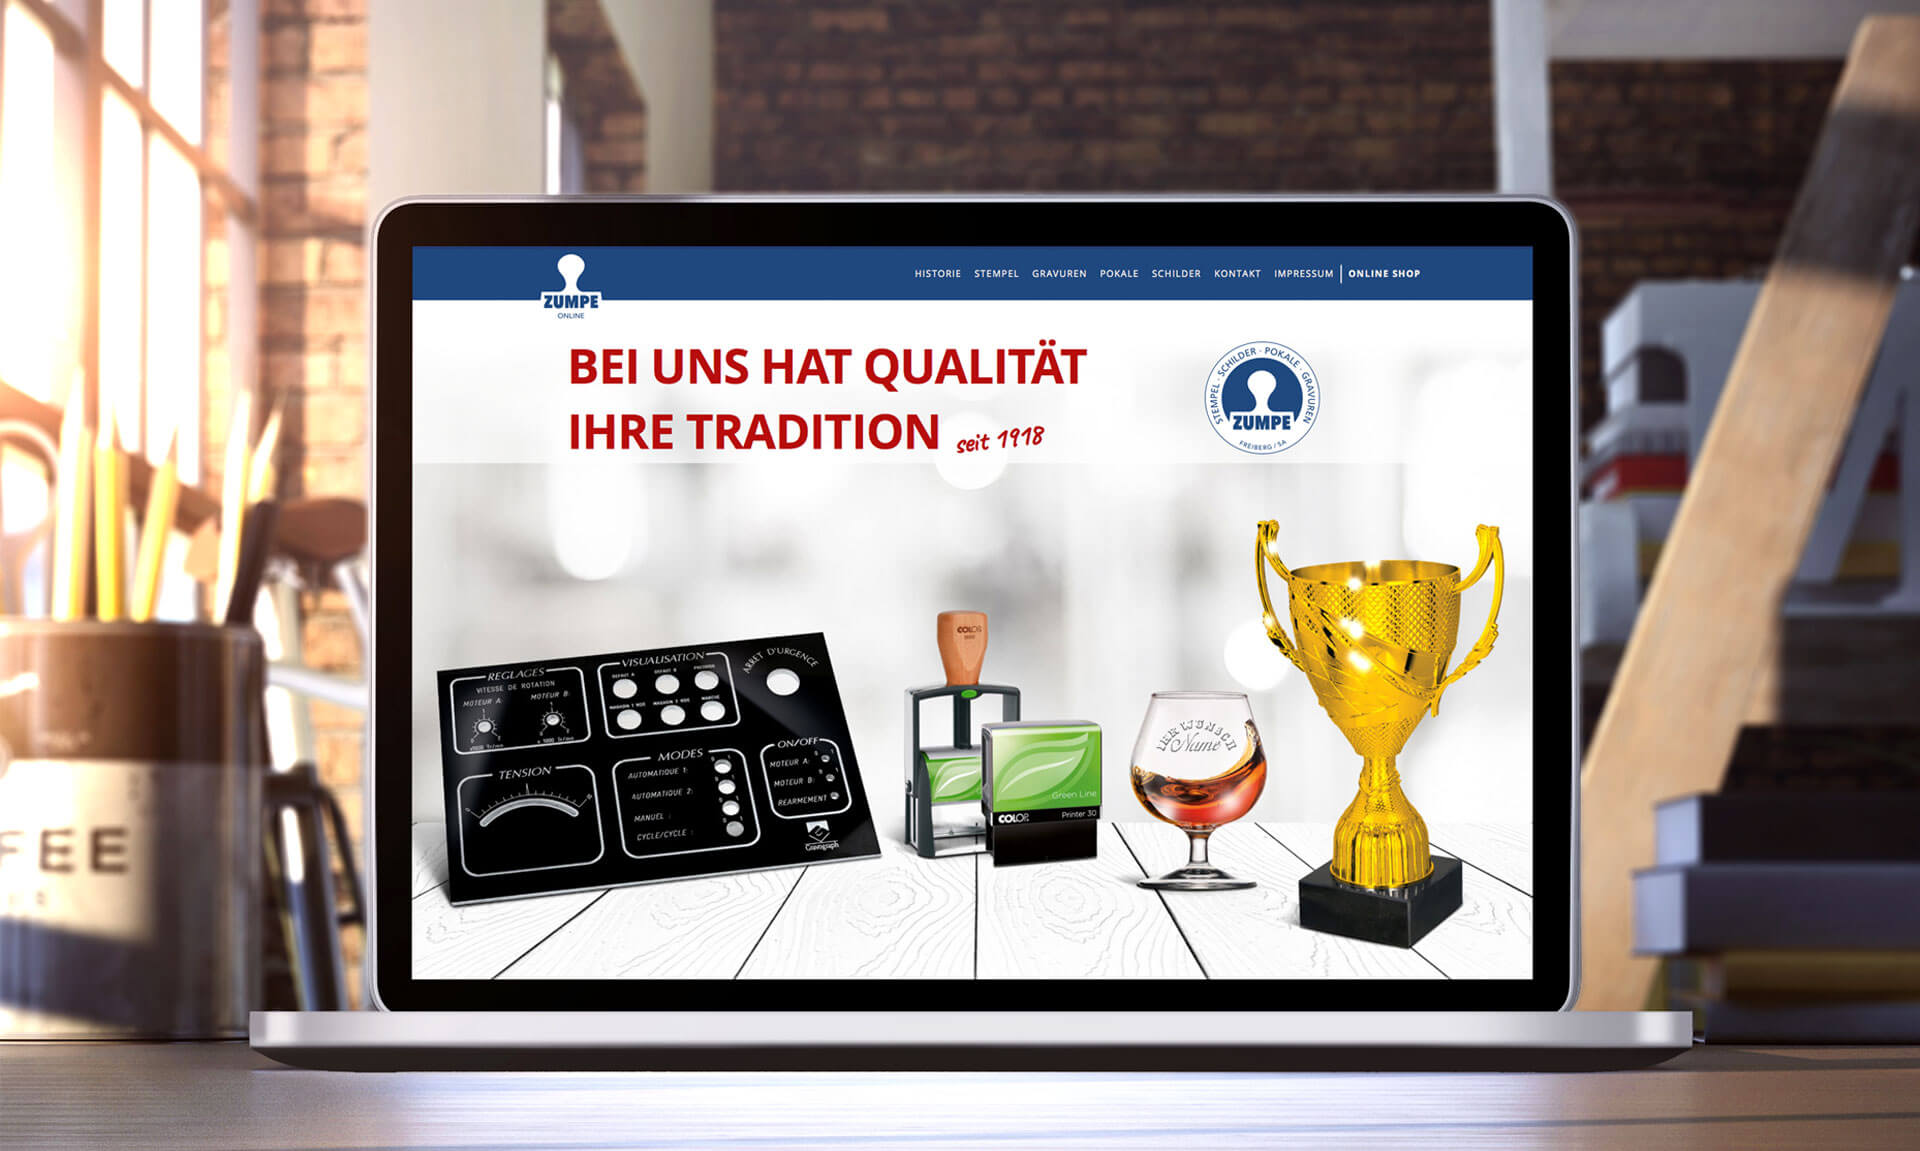 Zumpe Freiberg Webdesign - Referenz Maho Werbeagentur Dresden